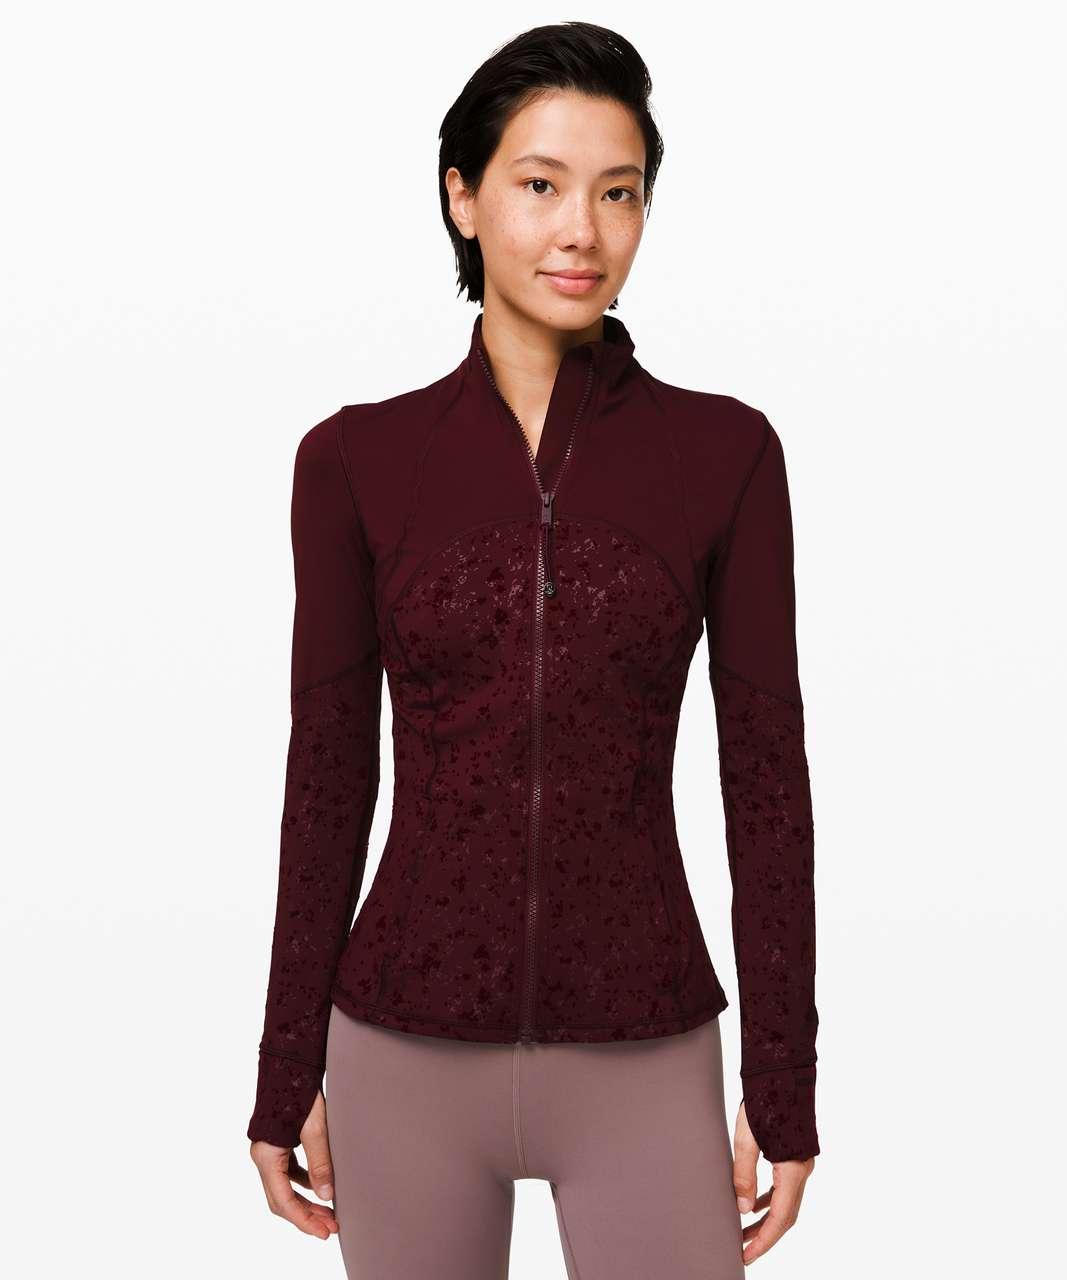 Lululemon Define Jacket *Speckle Shine - Garnet / Garnet